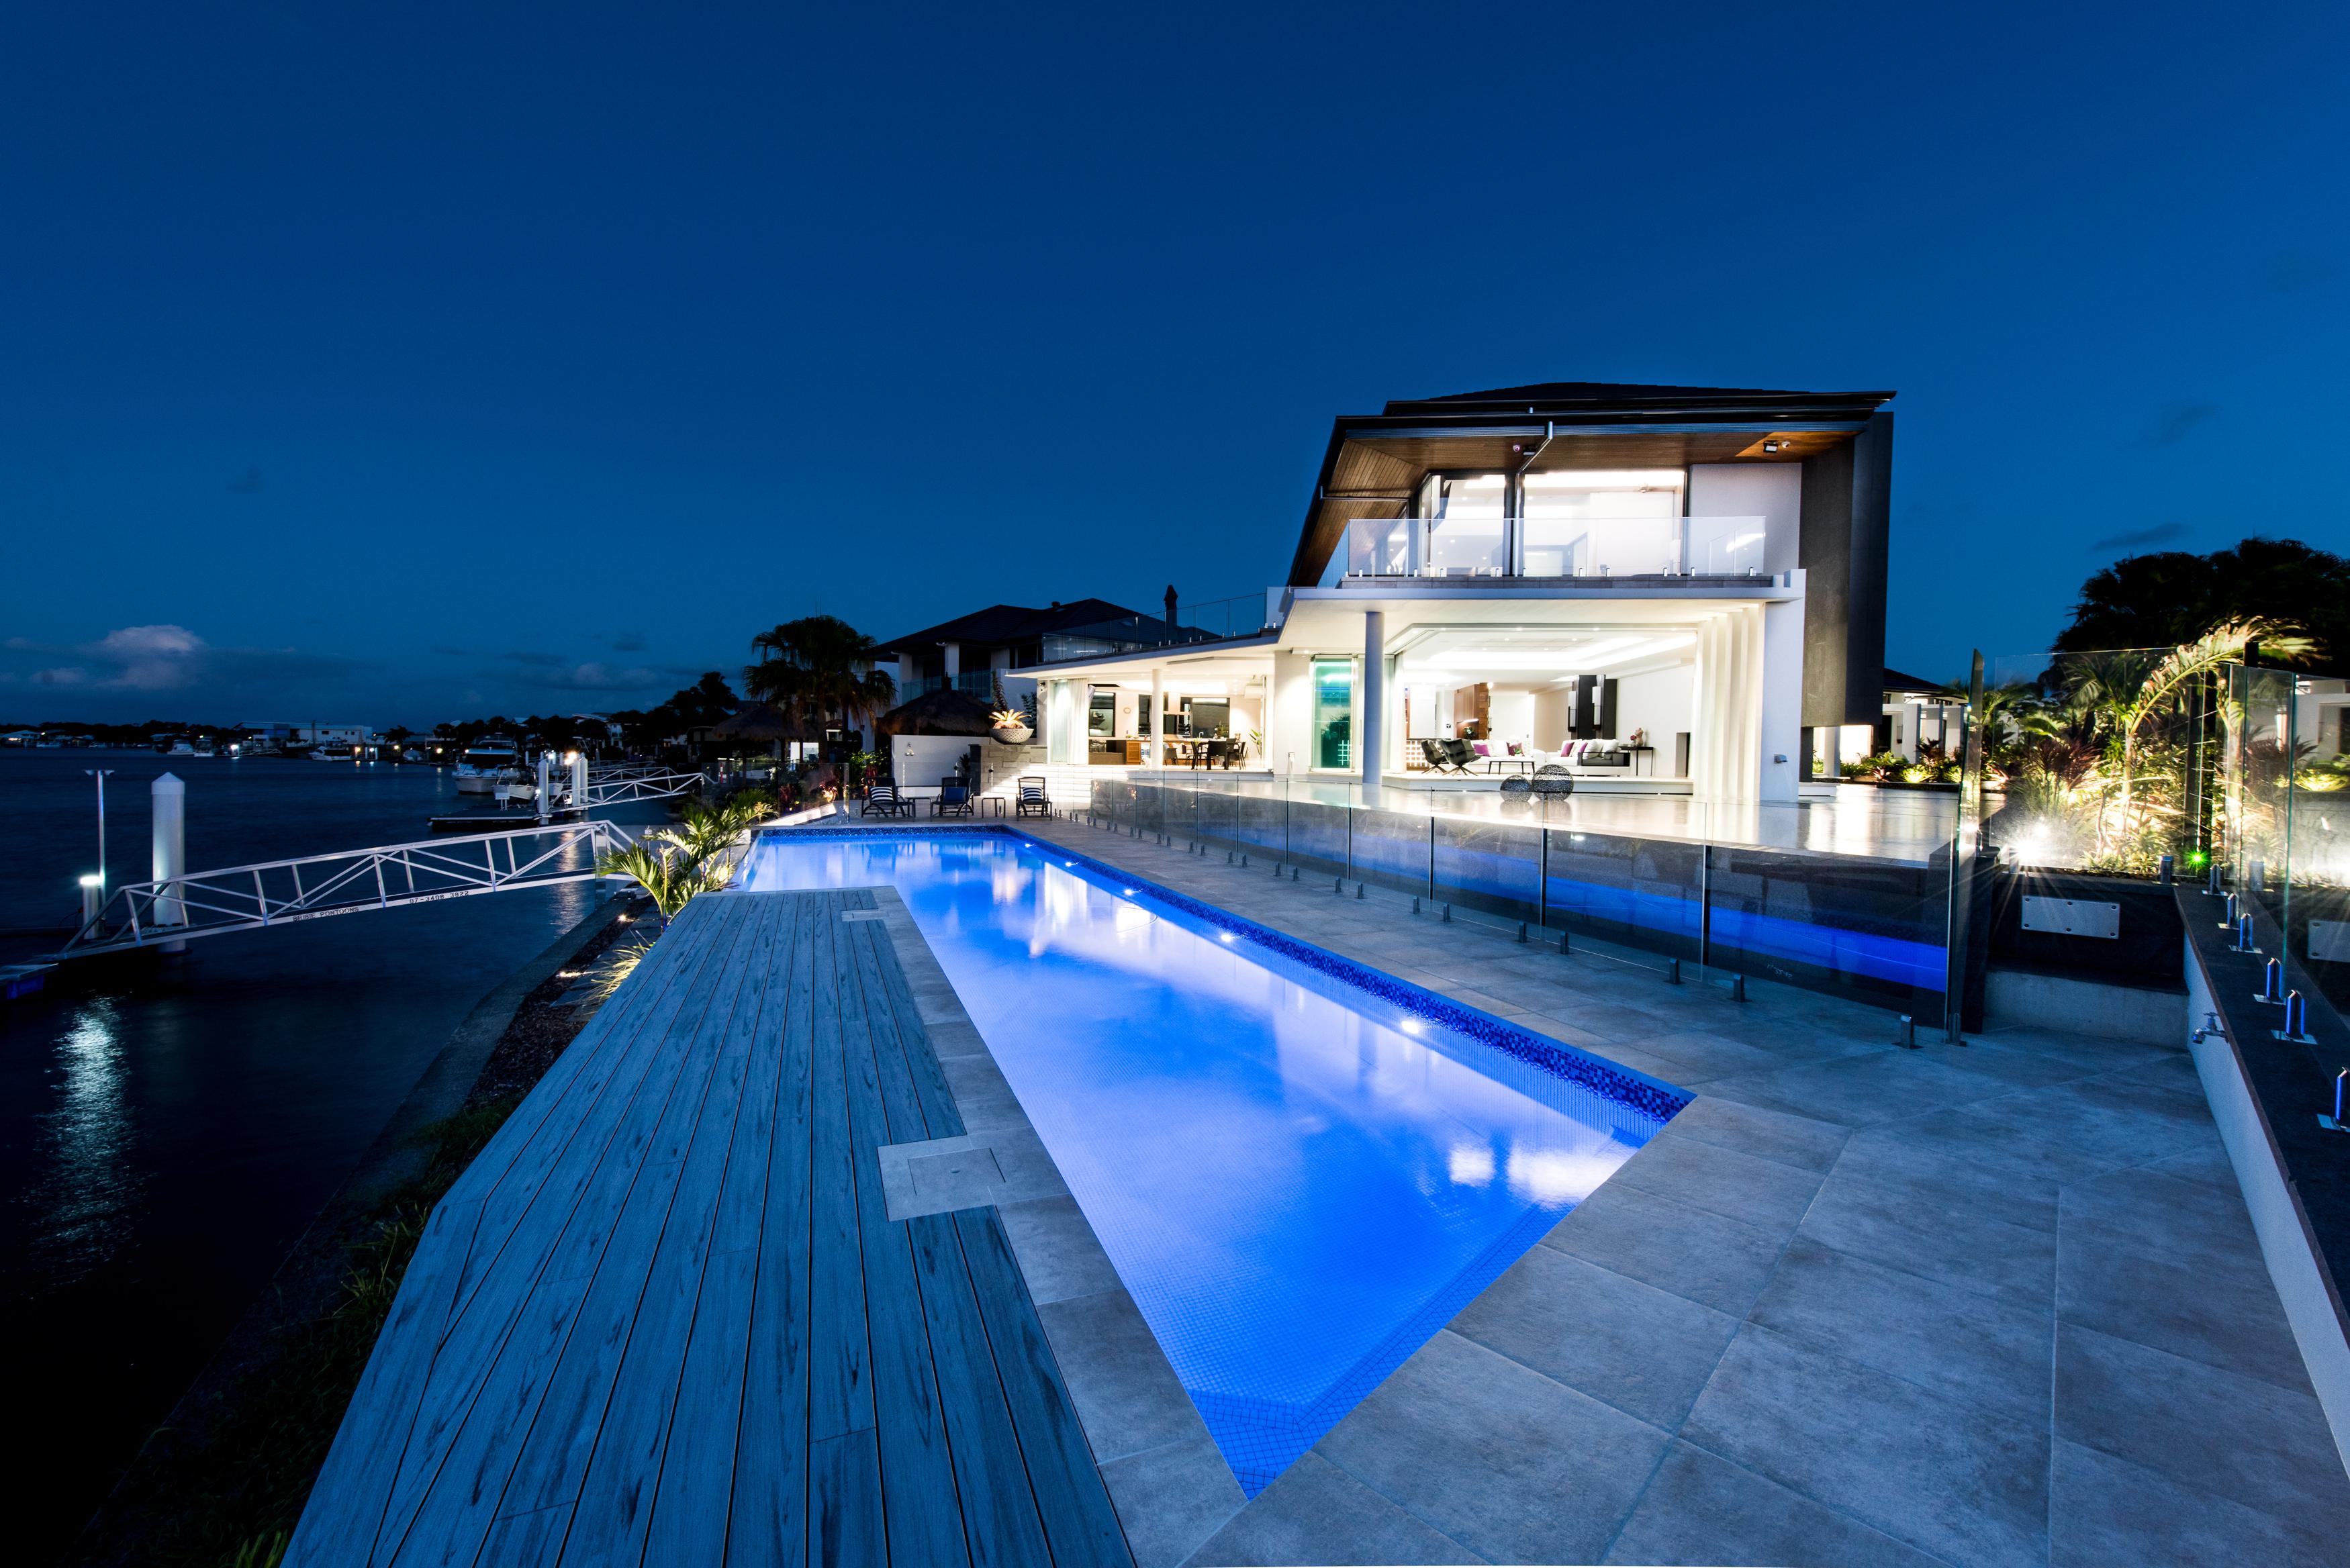 pool & living room